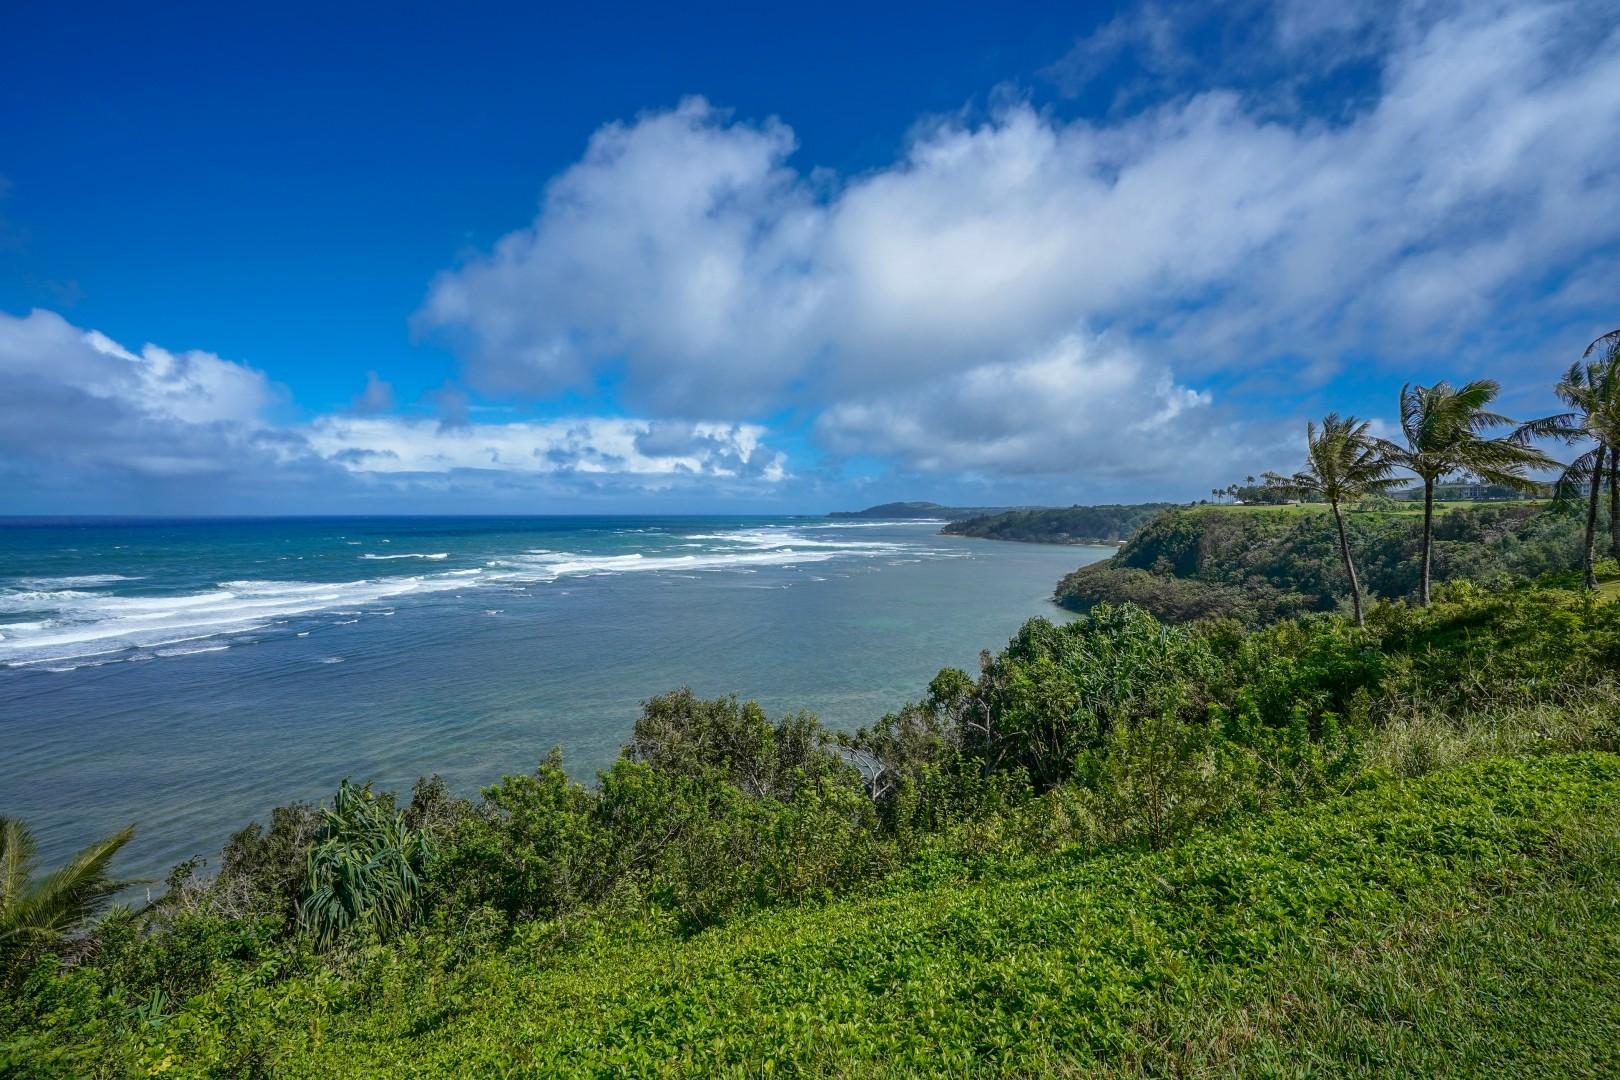 Cliffside, oceanfront property